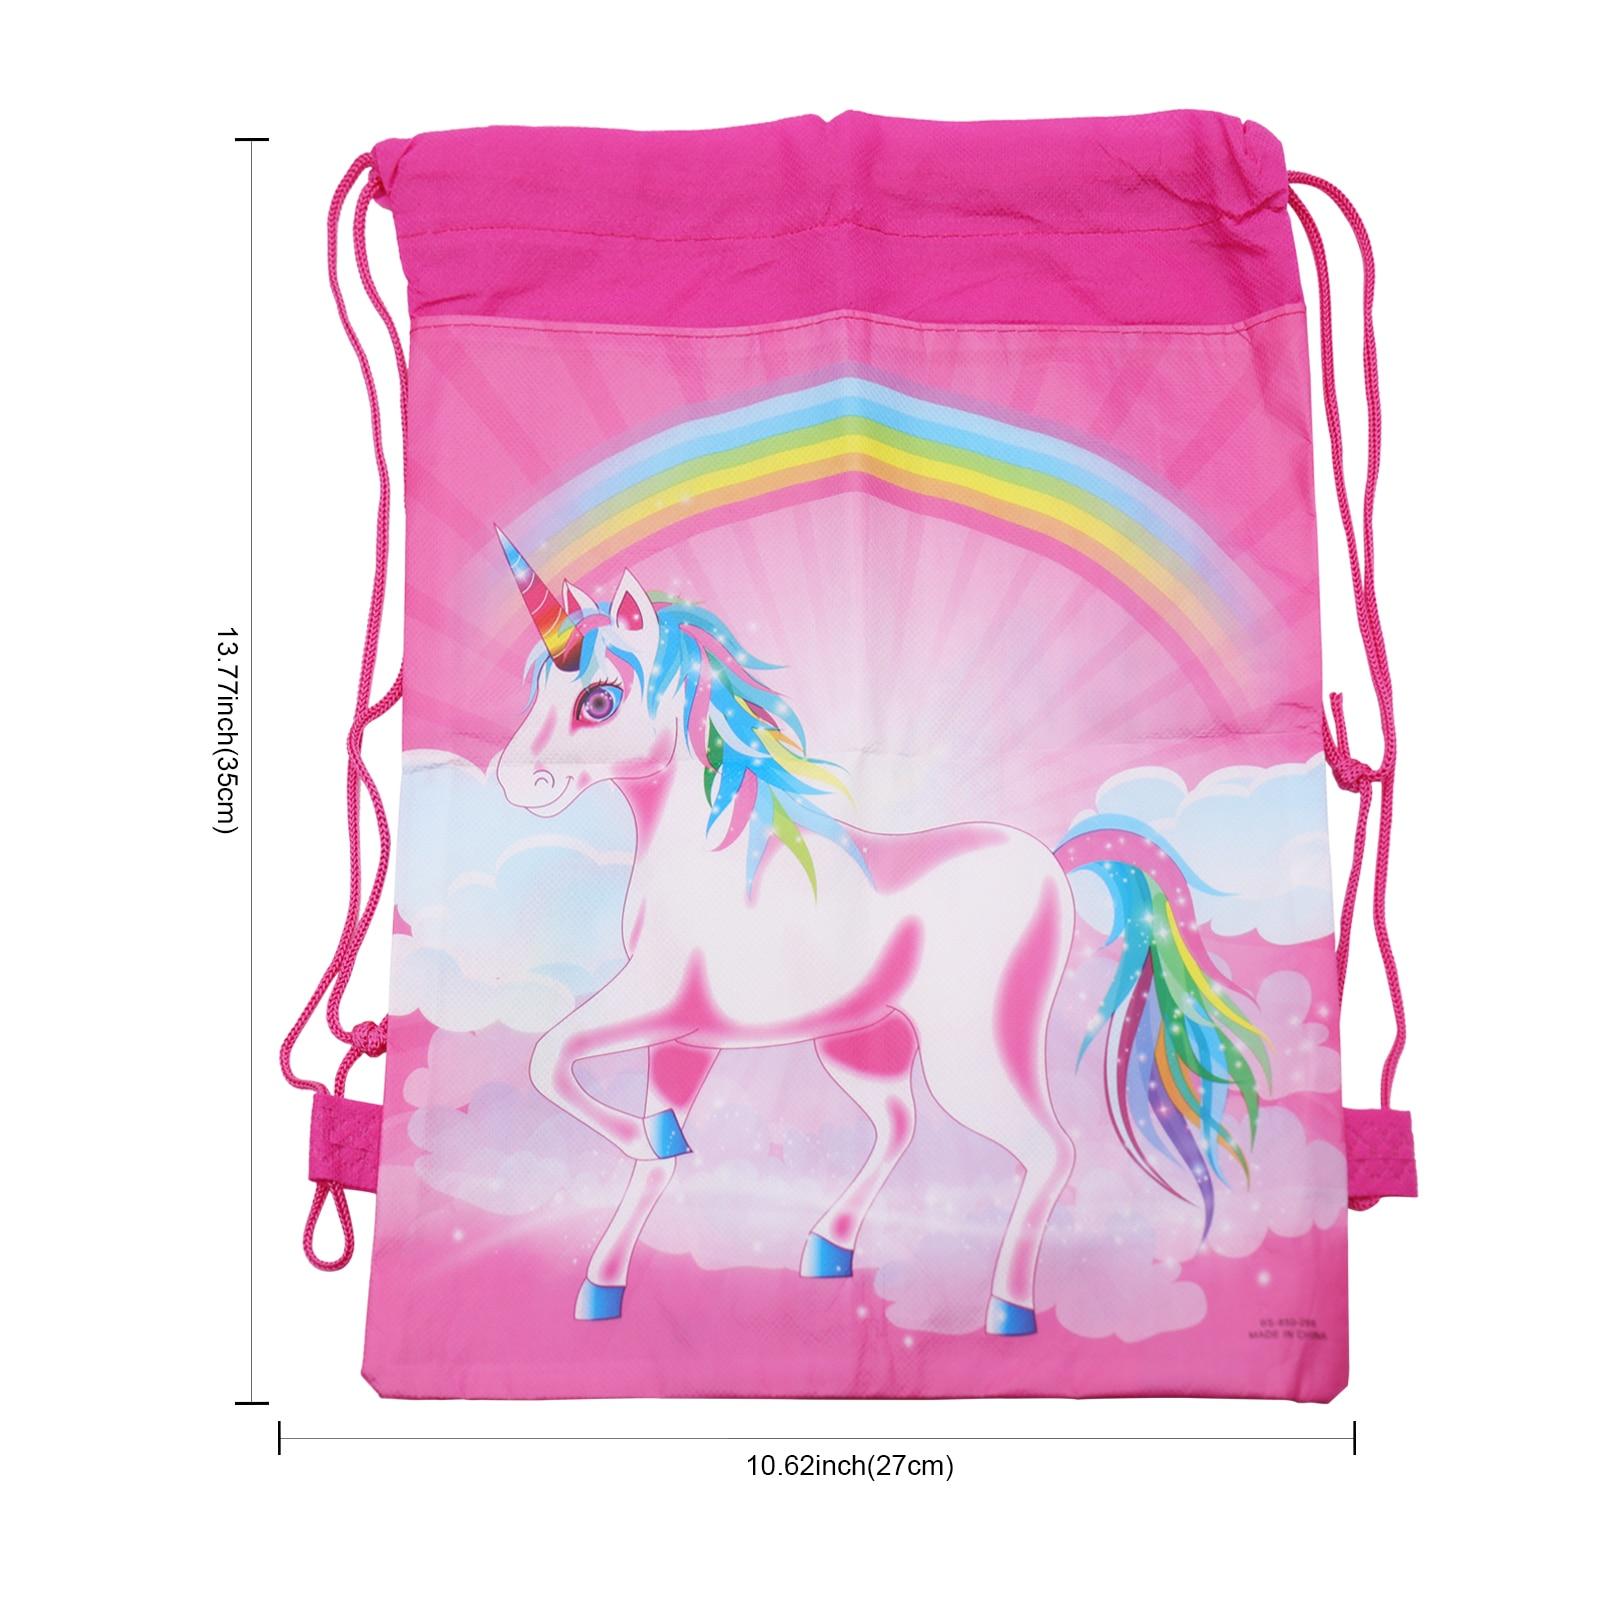 Купить с кэшбэком 27x35cm Fashion Drawstring Bag  Unicorn Mochila Feminina Drawstring Backpack Women daily Casual  portable travel storage bag